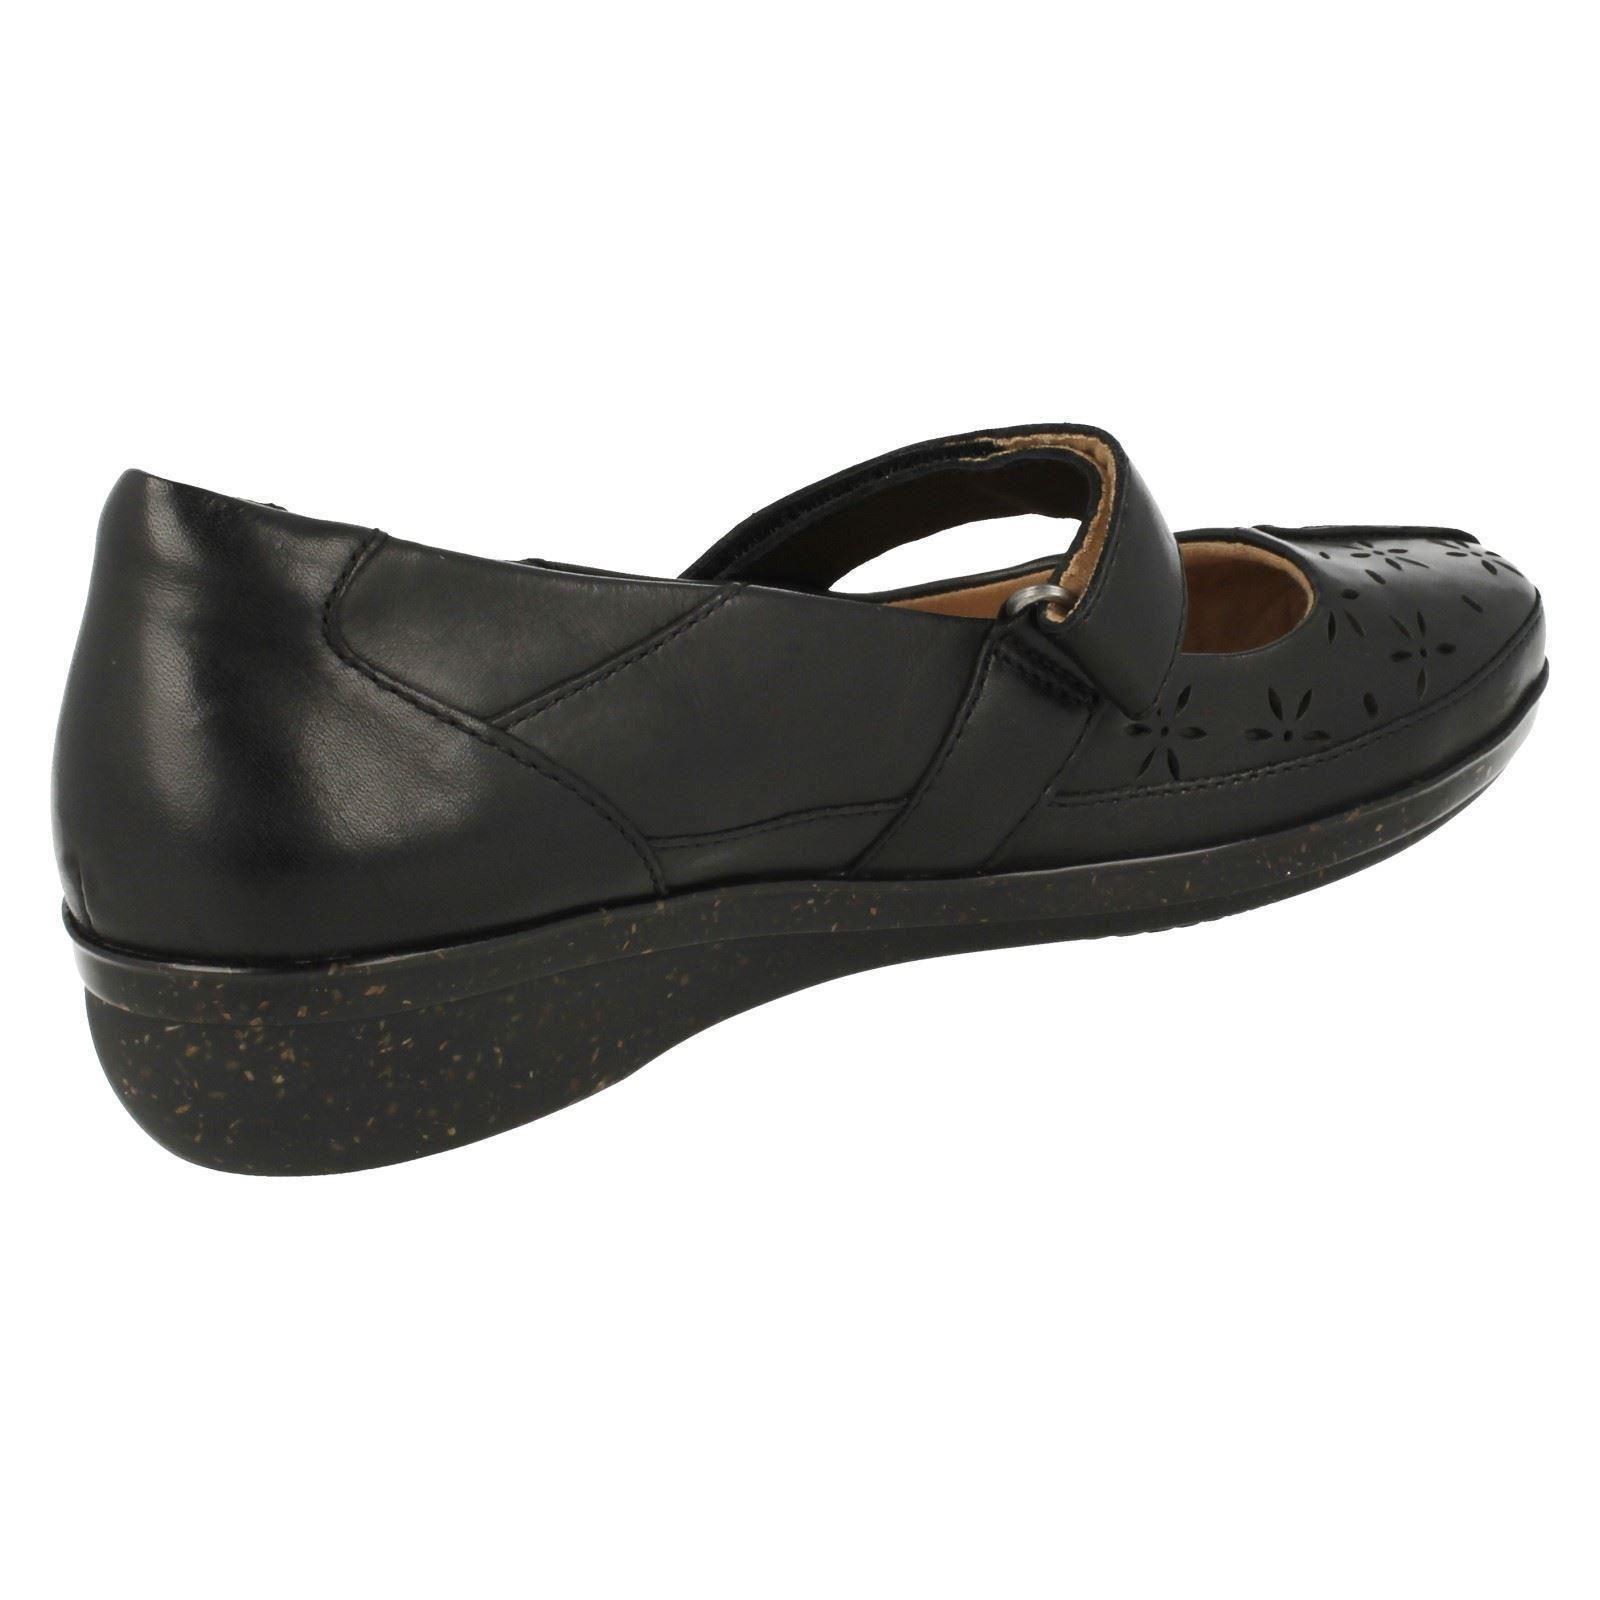 Ladies Clarks Casual Shoes Everlay Bai